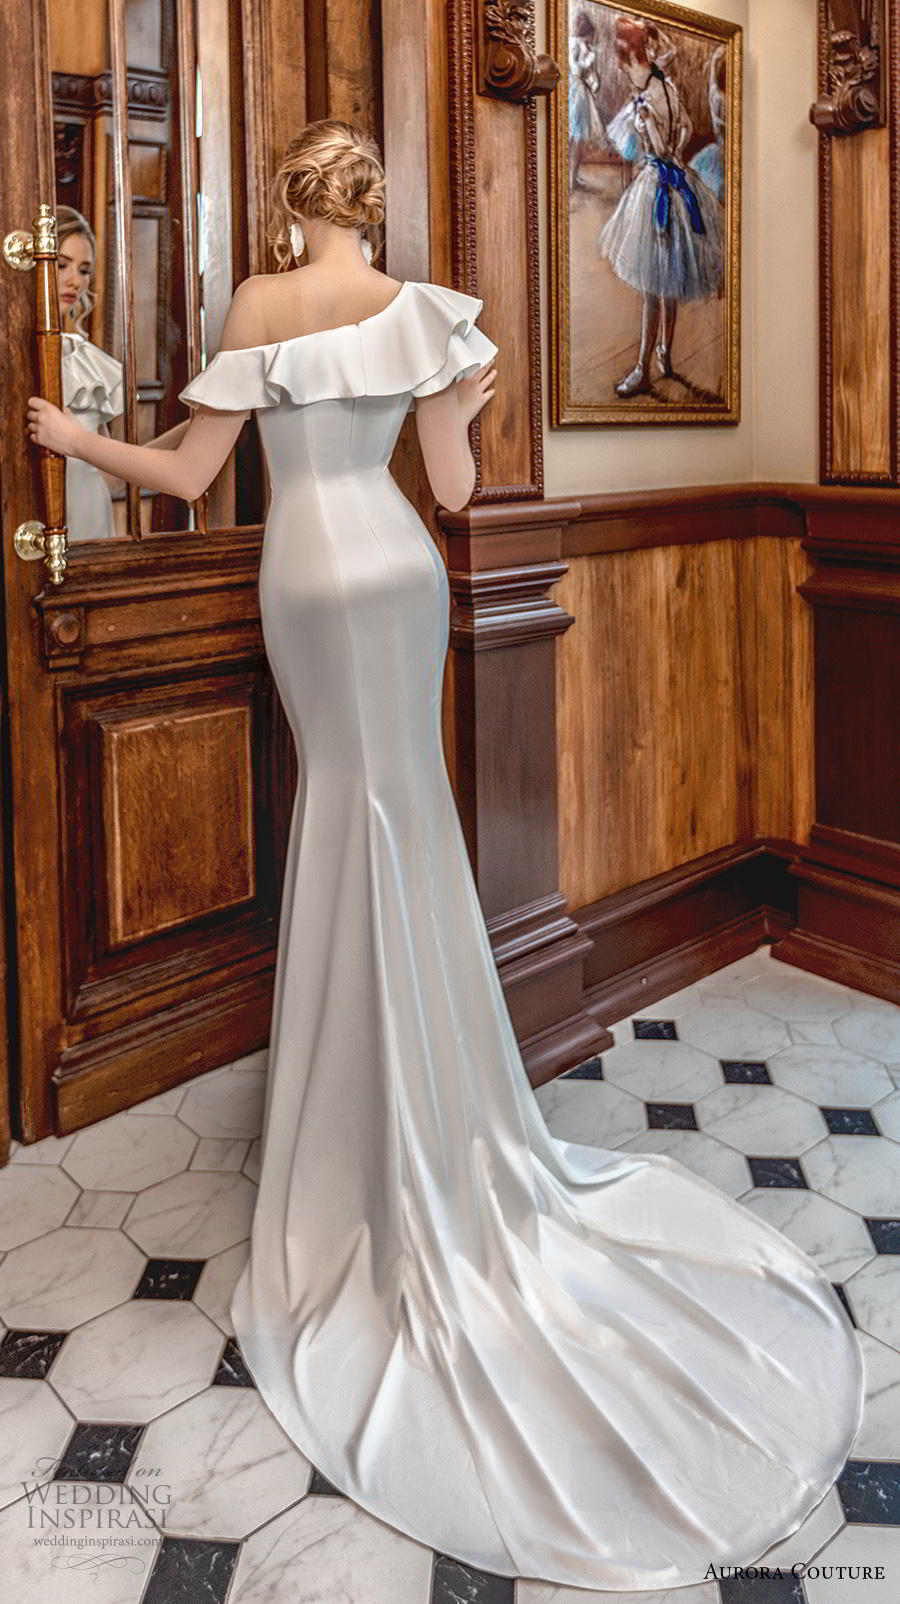 aurora couture 2019 bridal one shoulder flap neckline simple minimalist elegant fit and flare sheath wedding dress chapel train (16) bv